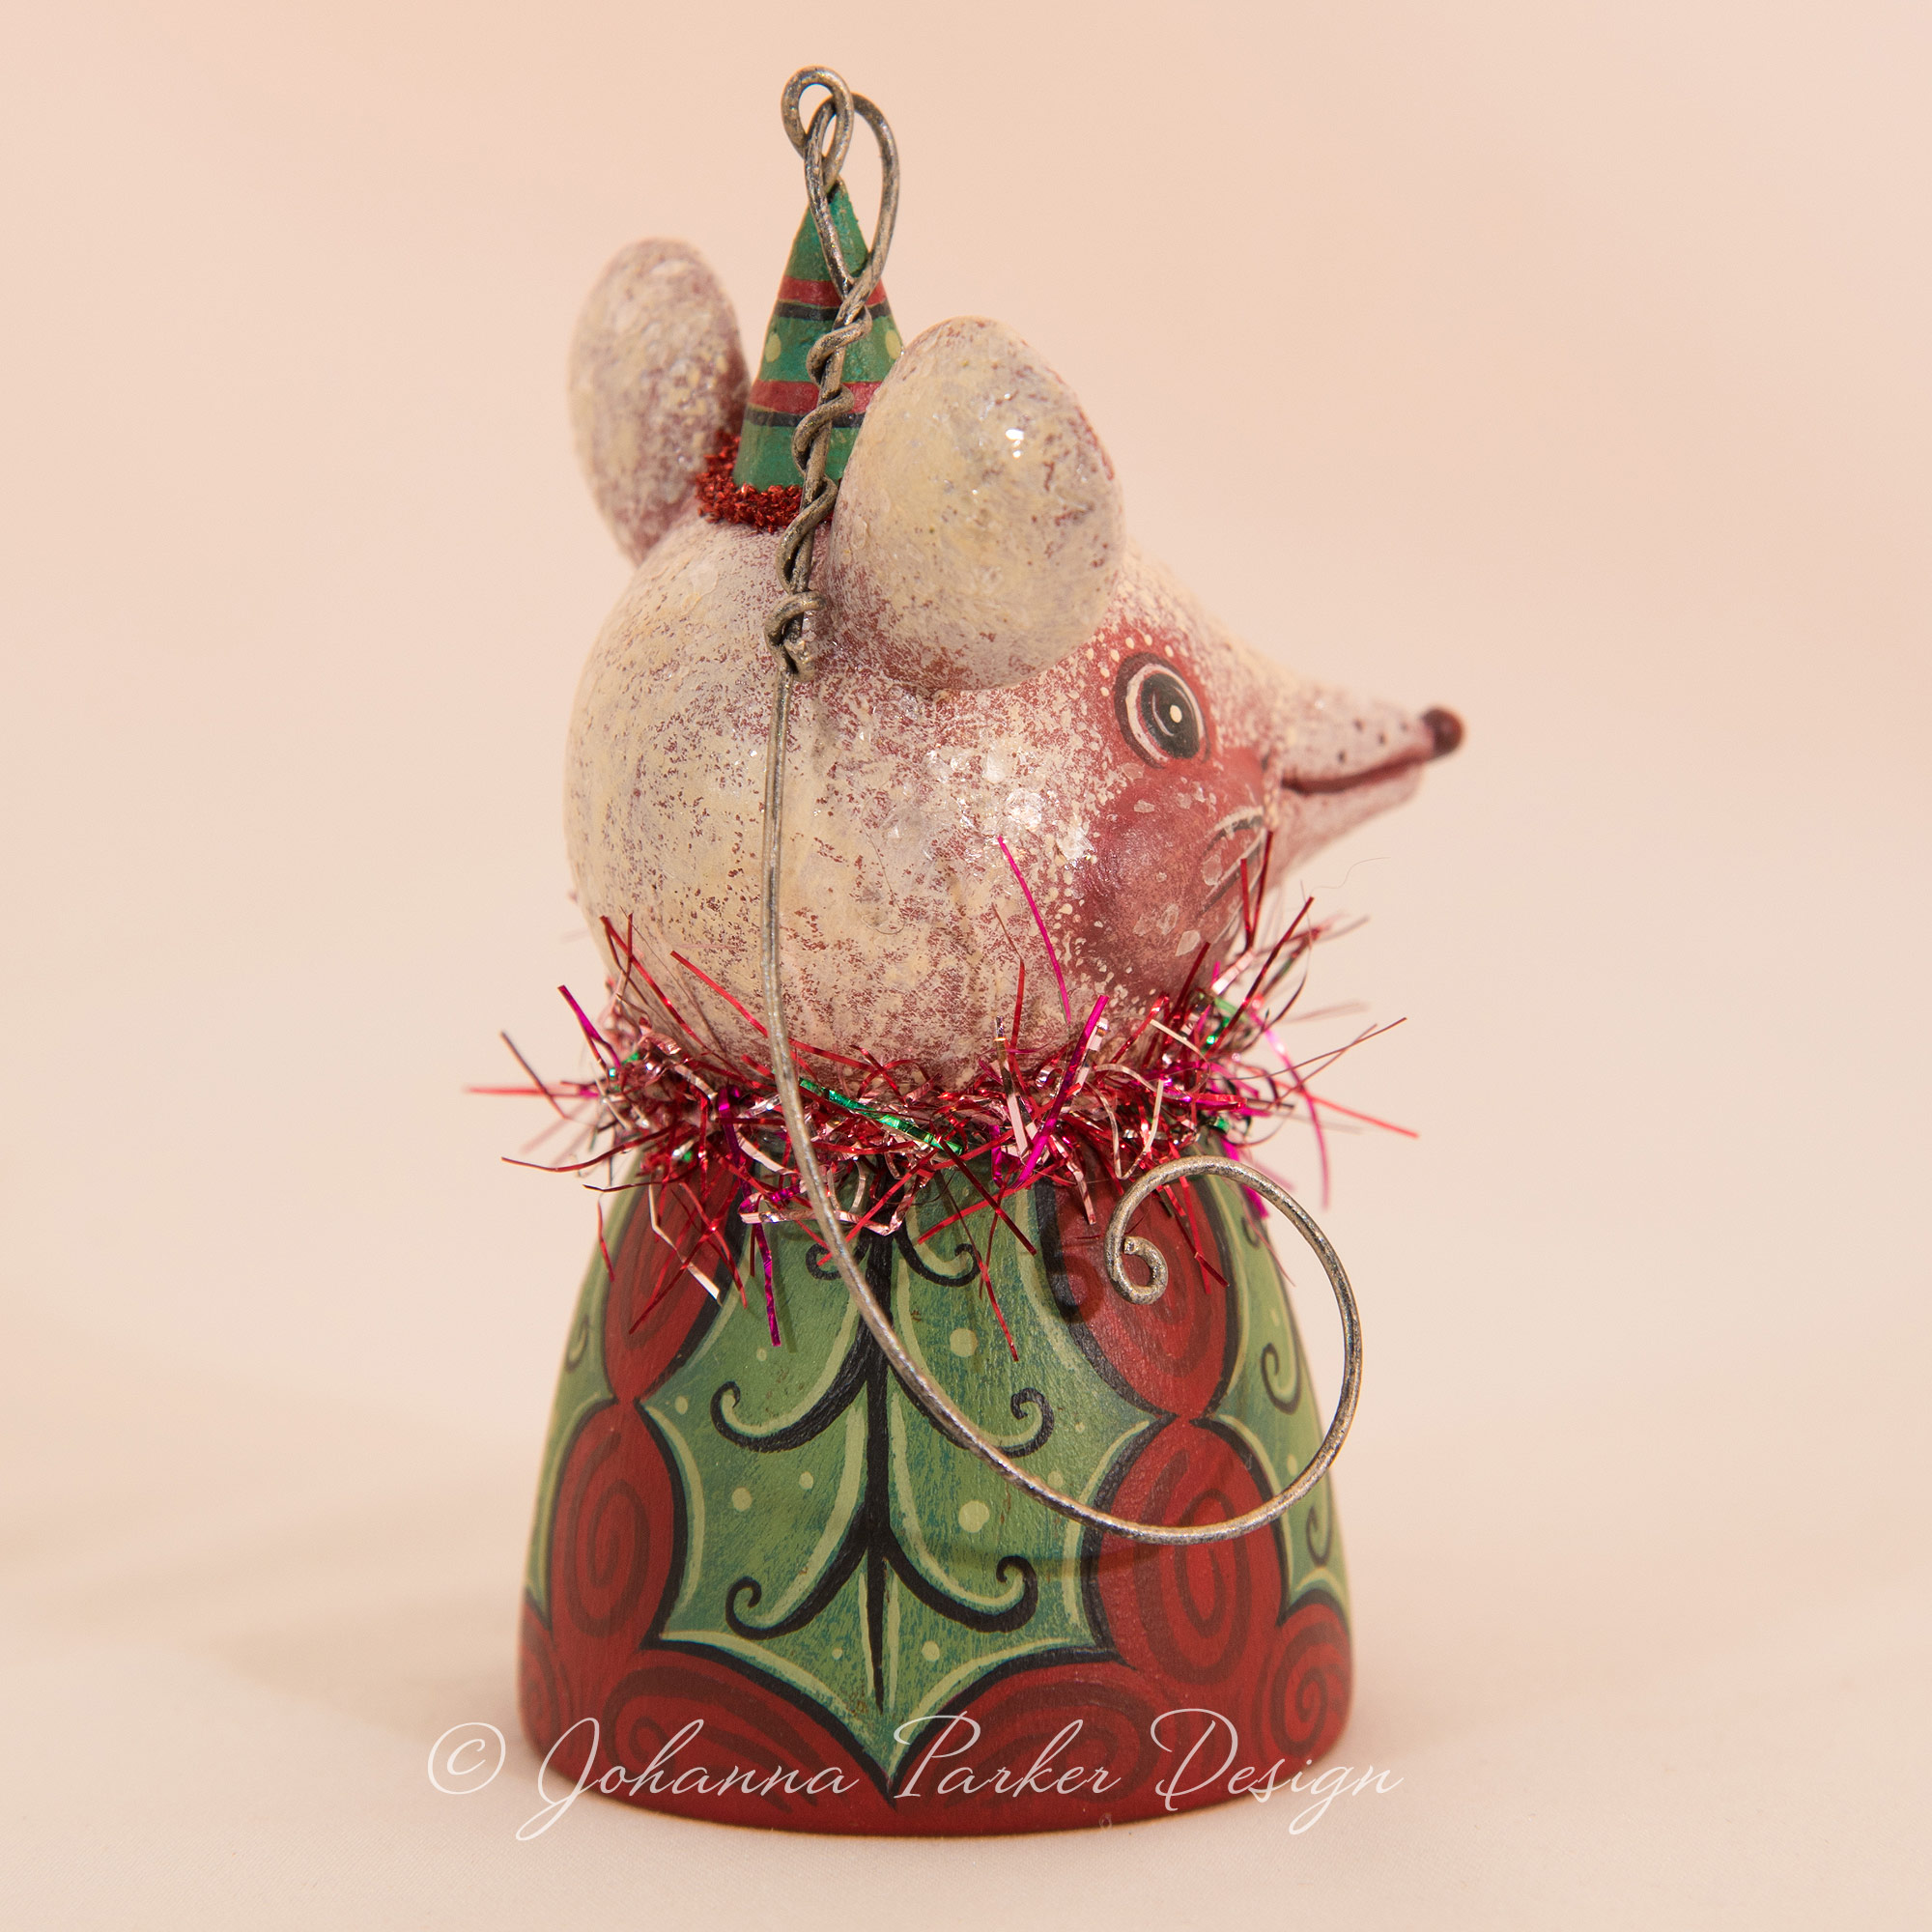 Johanna-Parker-Mouse-Ornament-Bell-4.jpg